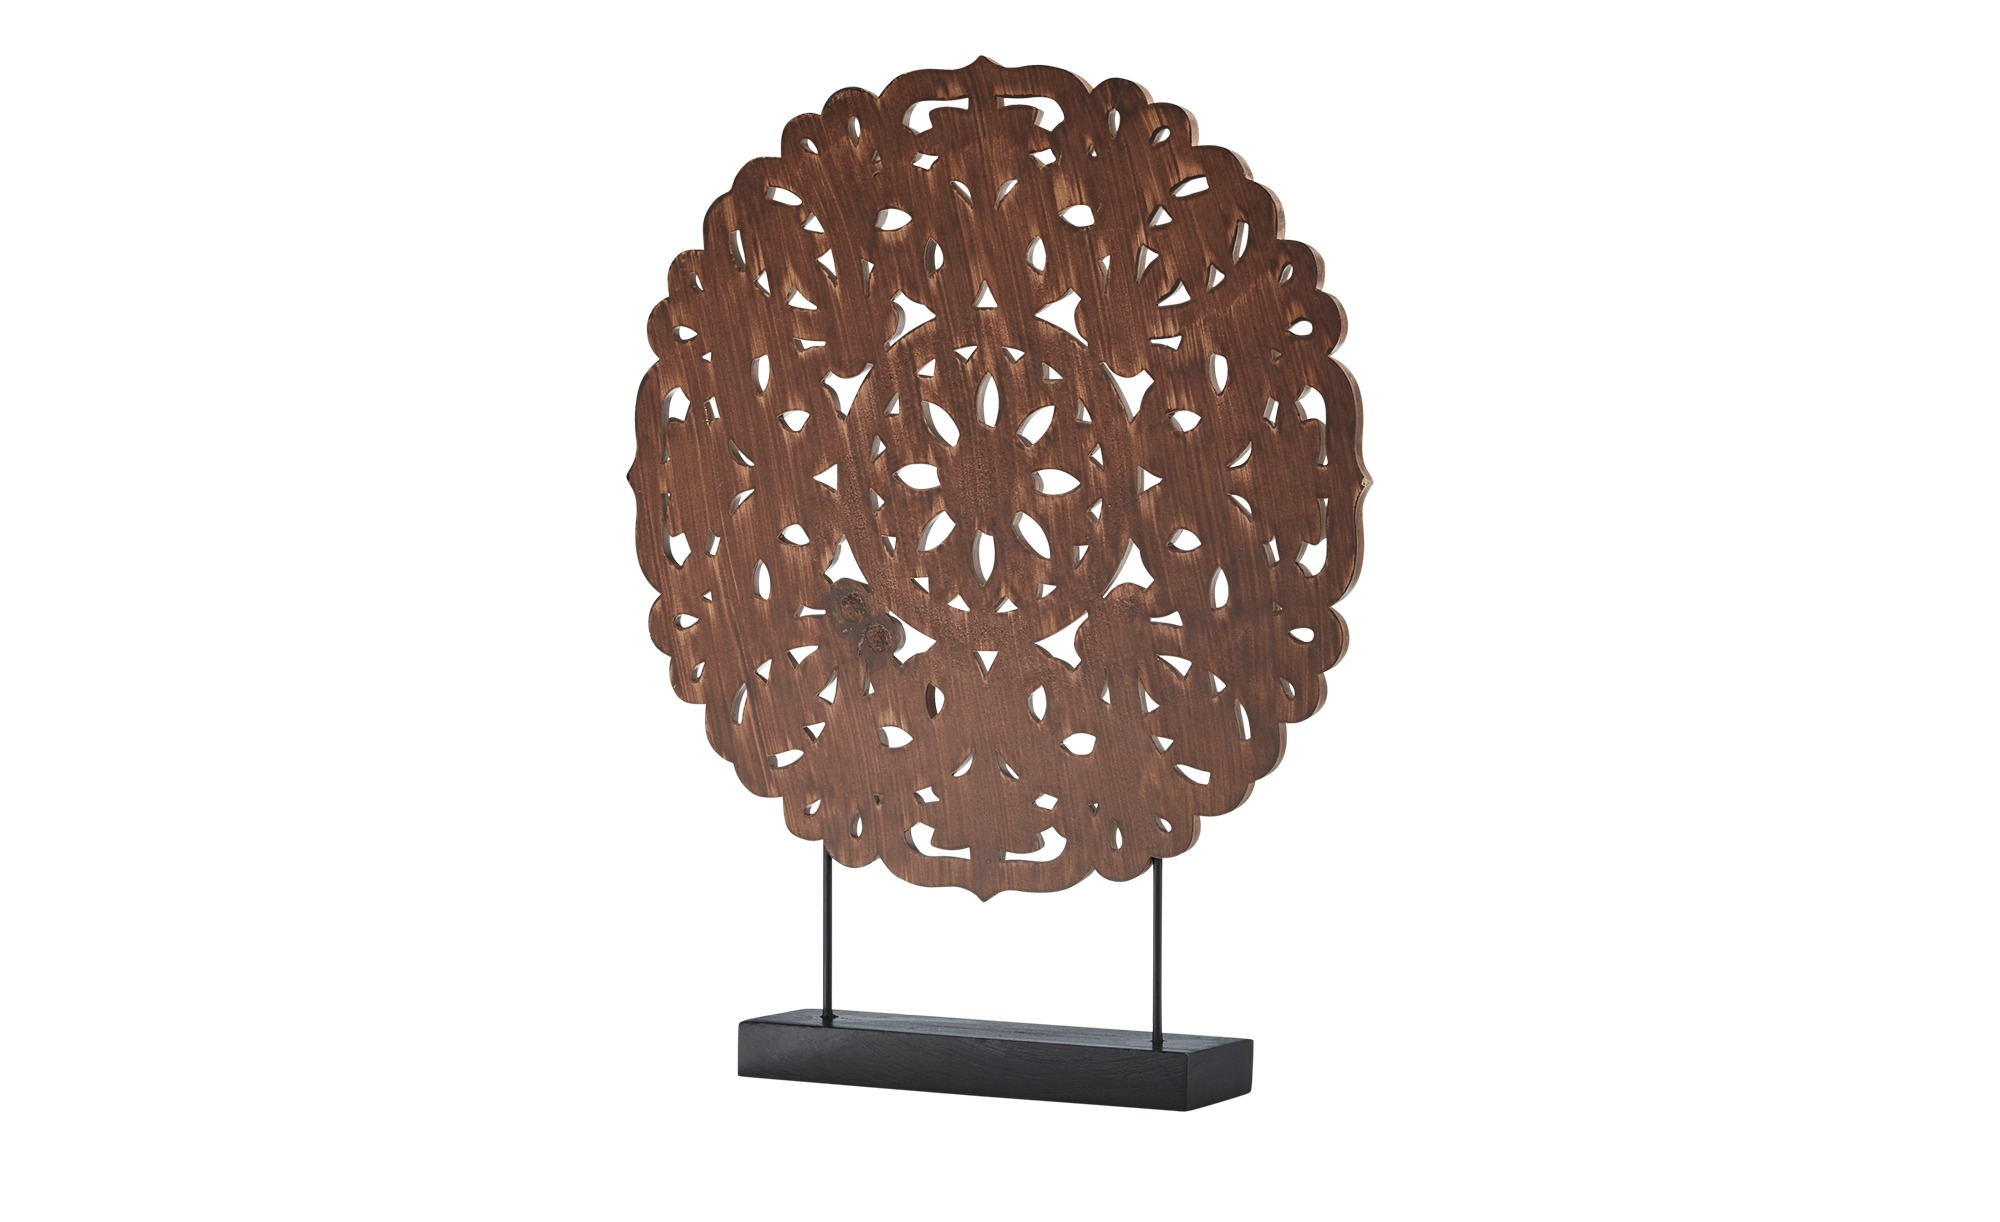 Deko Ornament.Deko Ornament Gefunden Bei Möbel Kraft